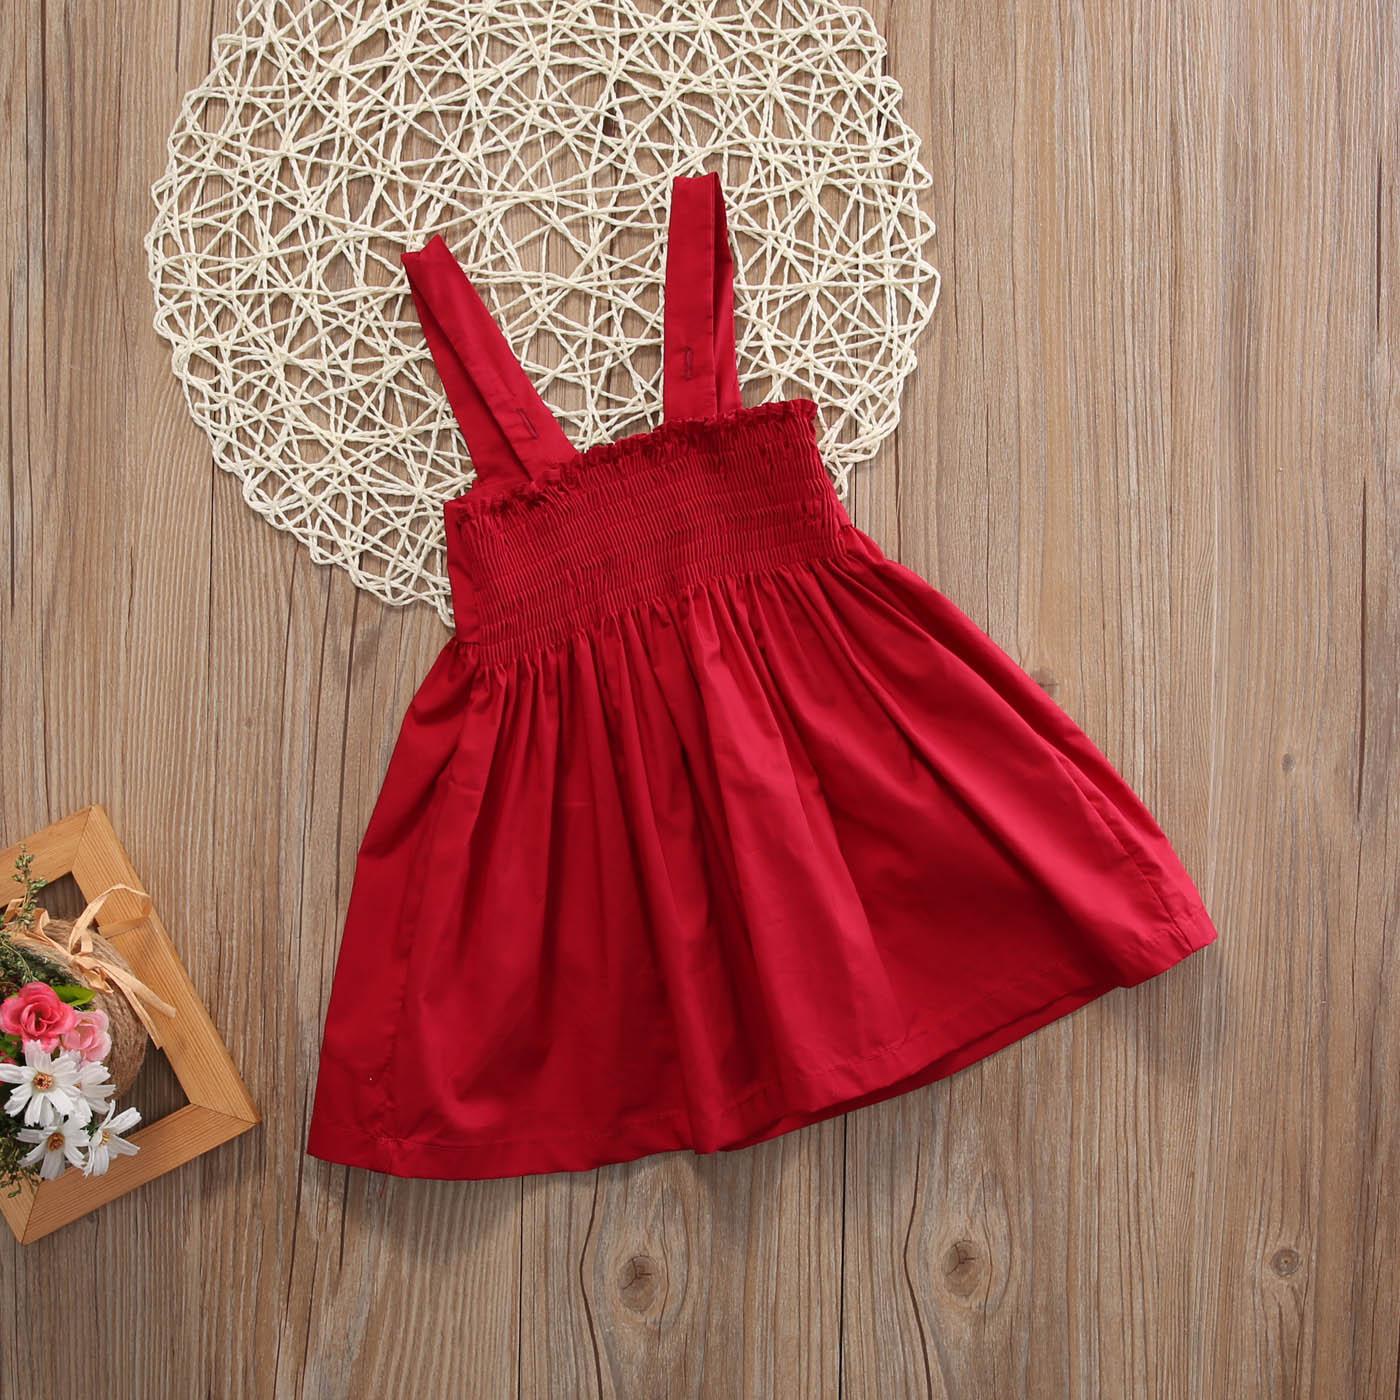 Brandnew Summer 2017 Baby Girls Dress Toddler Kid Summer Sundress Bowknot Mini Bow Dress Outfit Suntsuit Dress